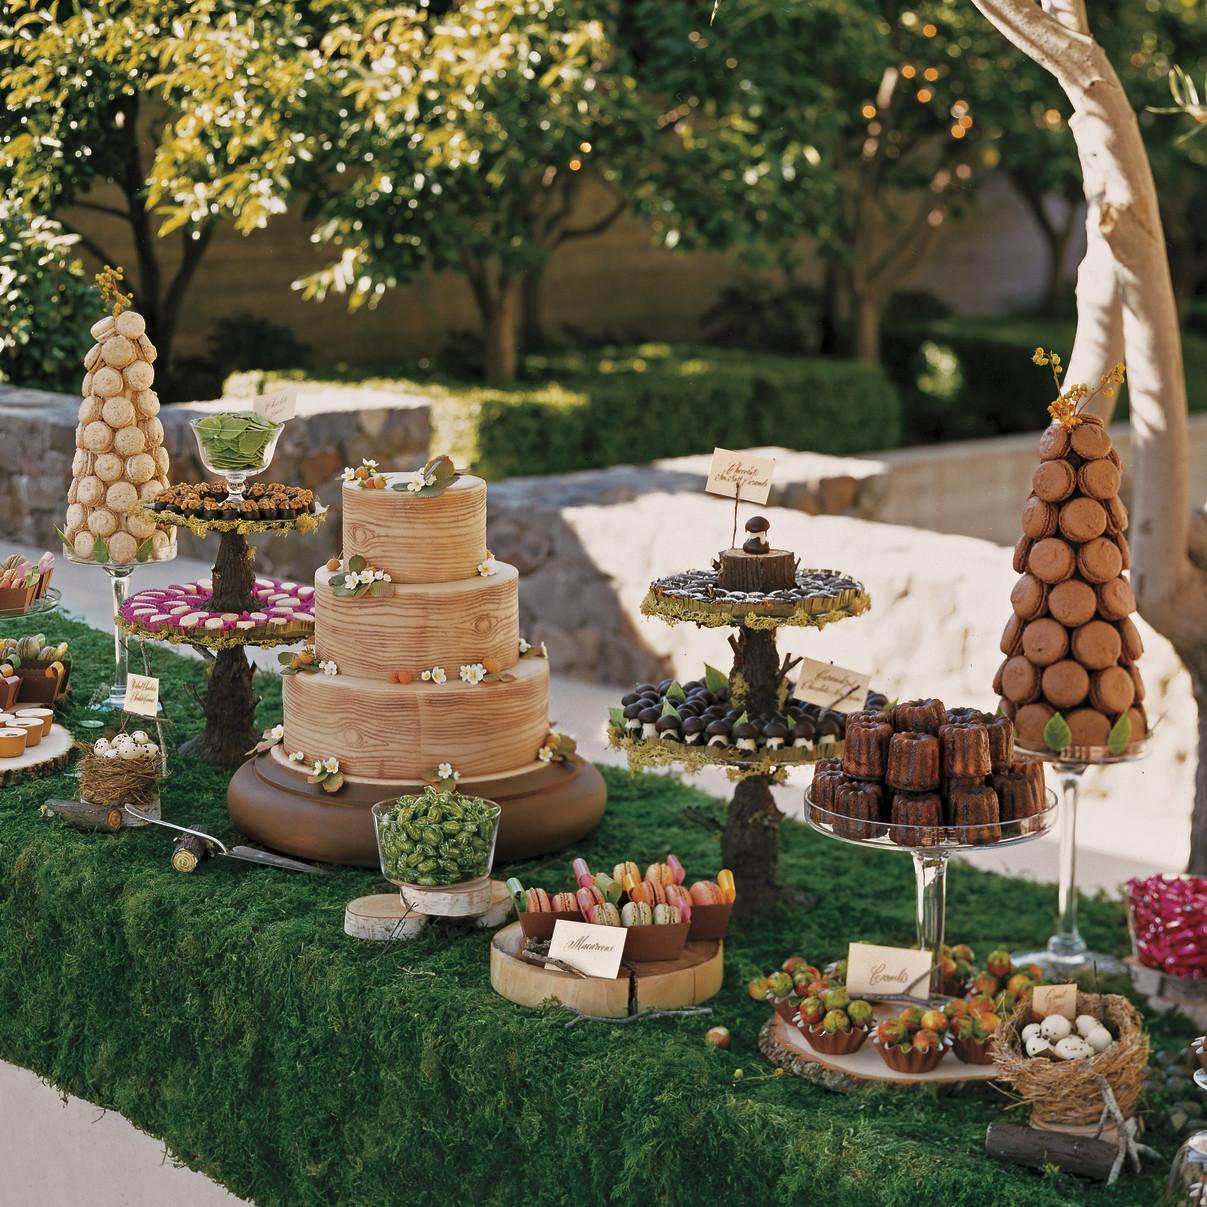 Woodland Wedding Invitations 004 - Woodland Wedding Invitations